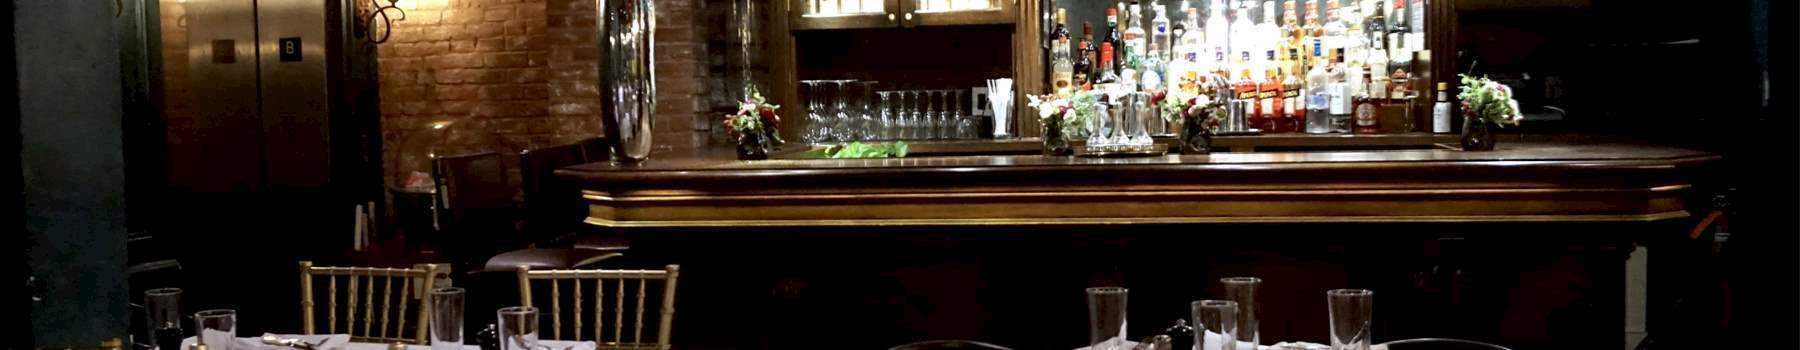 Eat & Drink at Hotel Edison Newyork